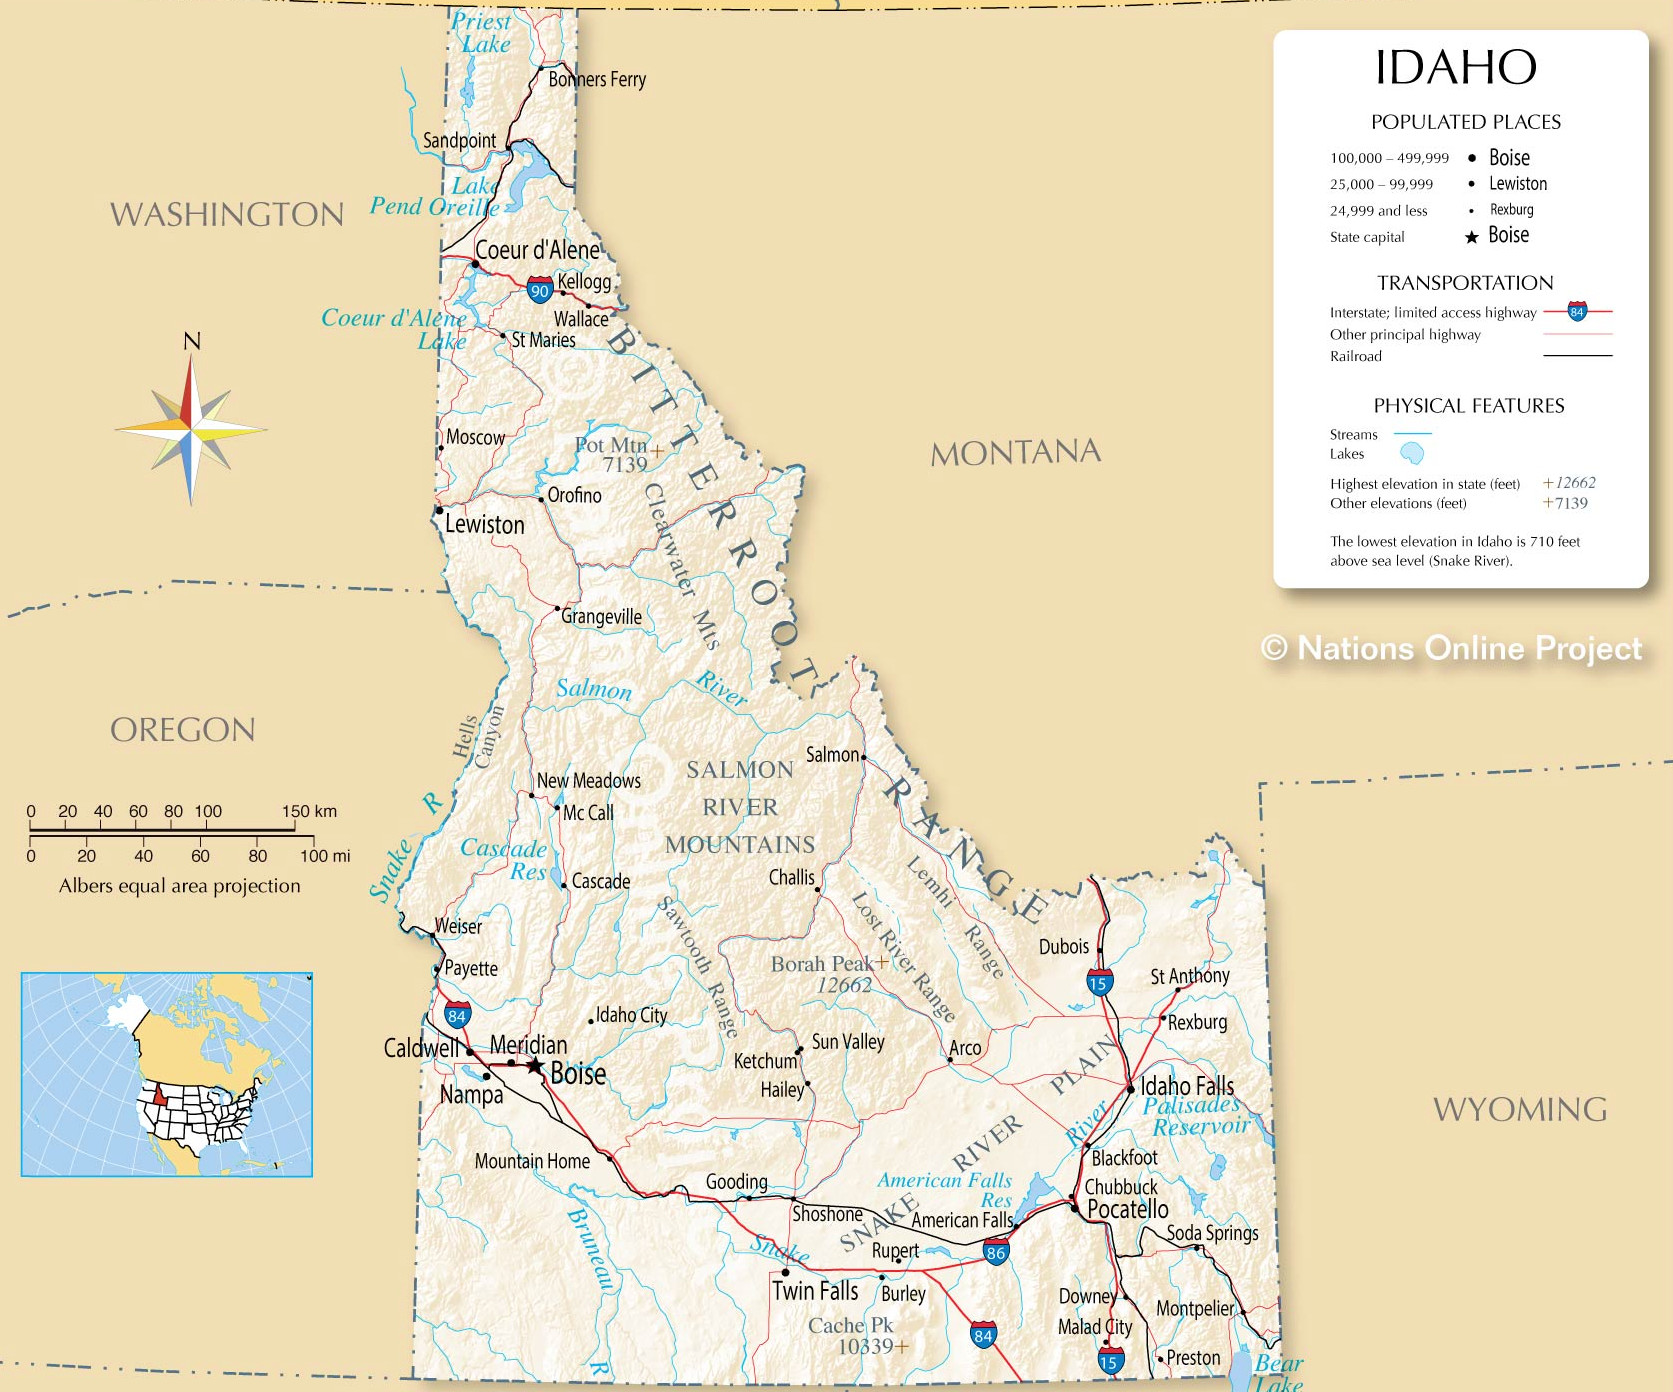 Idaho detailed map.